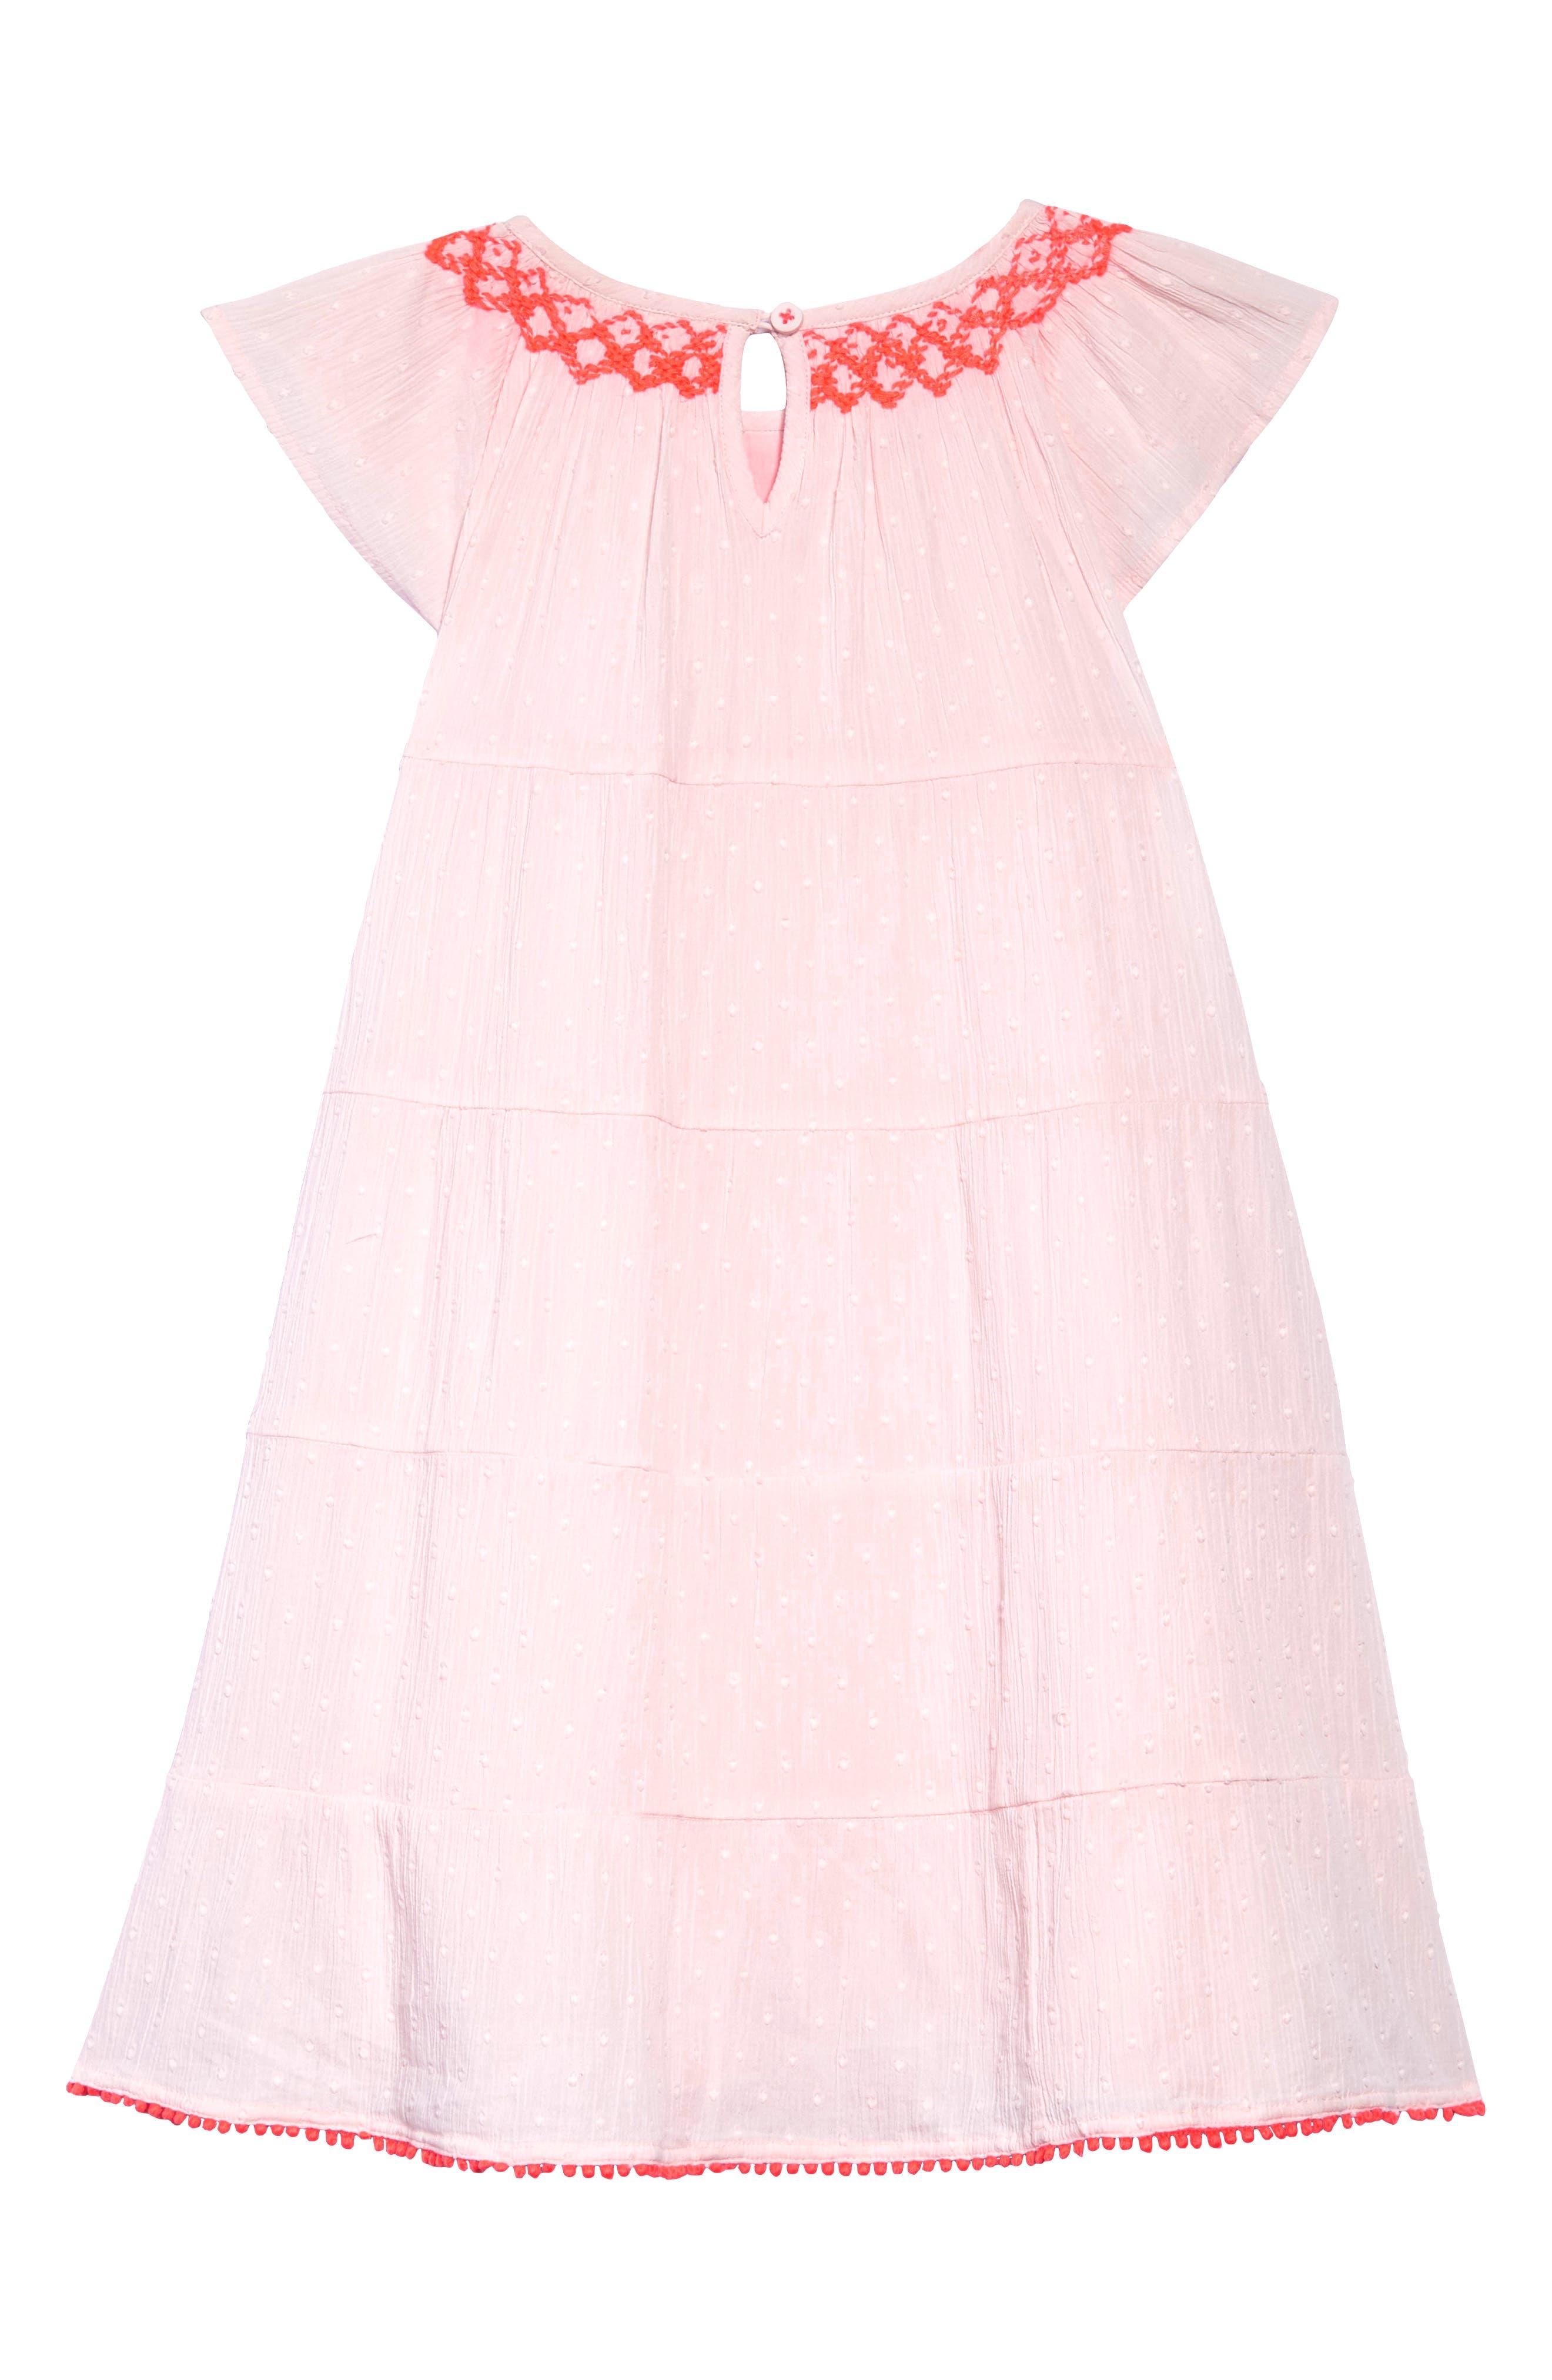 Twirly Dress,                             Alternate thumbnail 2, color,                             Pink Mist Pnk